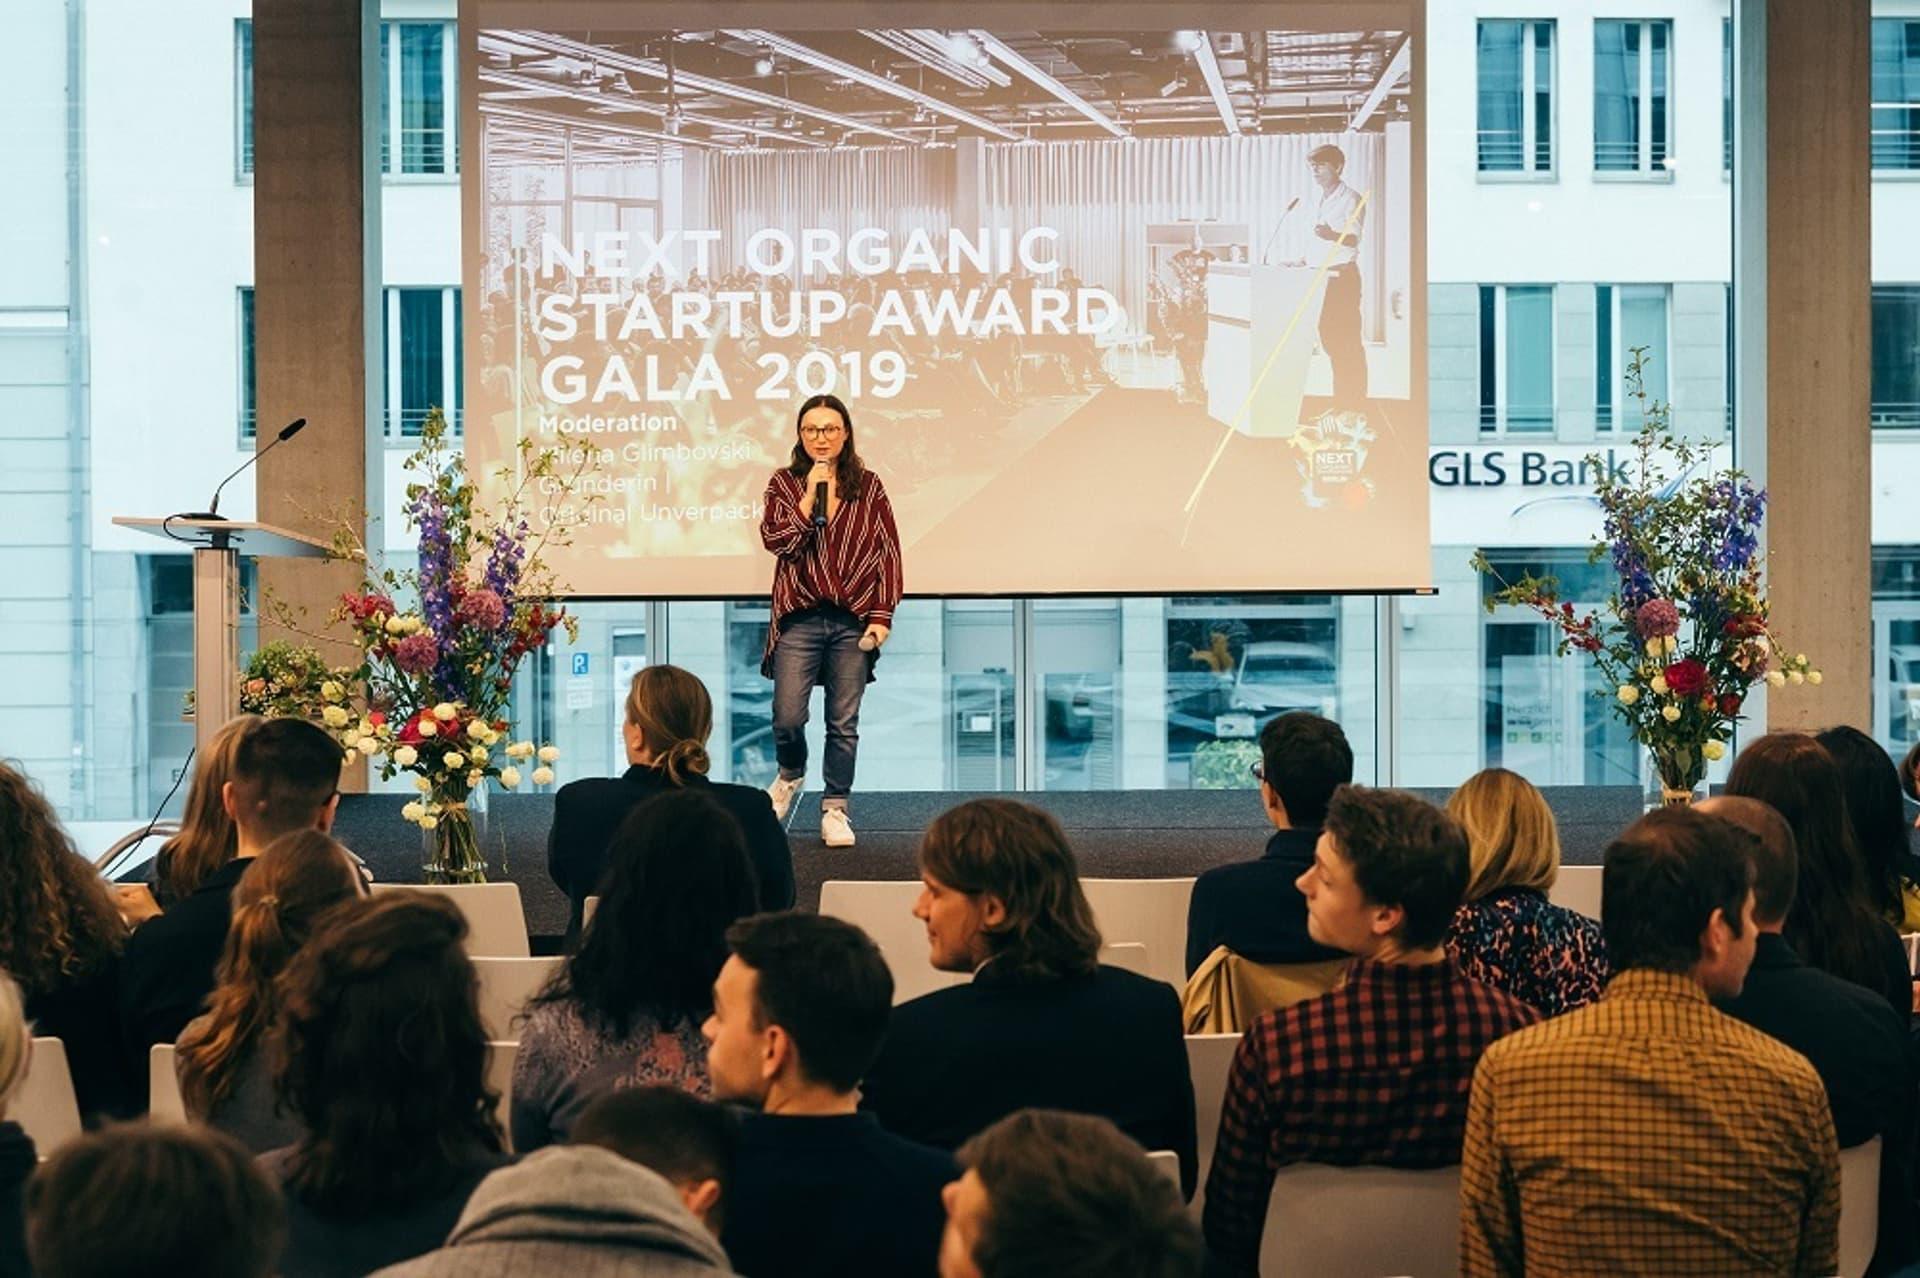 Stefanhaehnel nextorganic startupaward2019 5